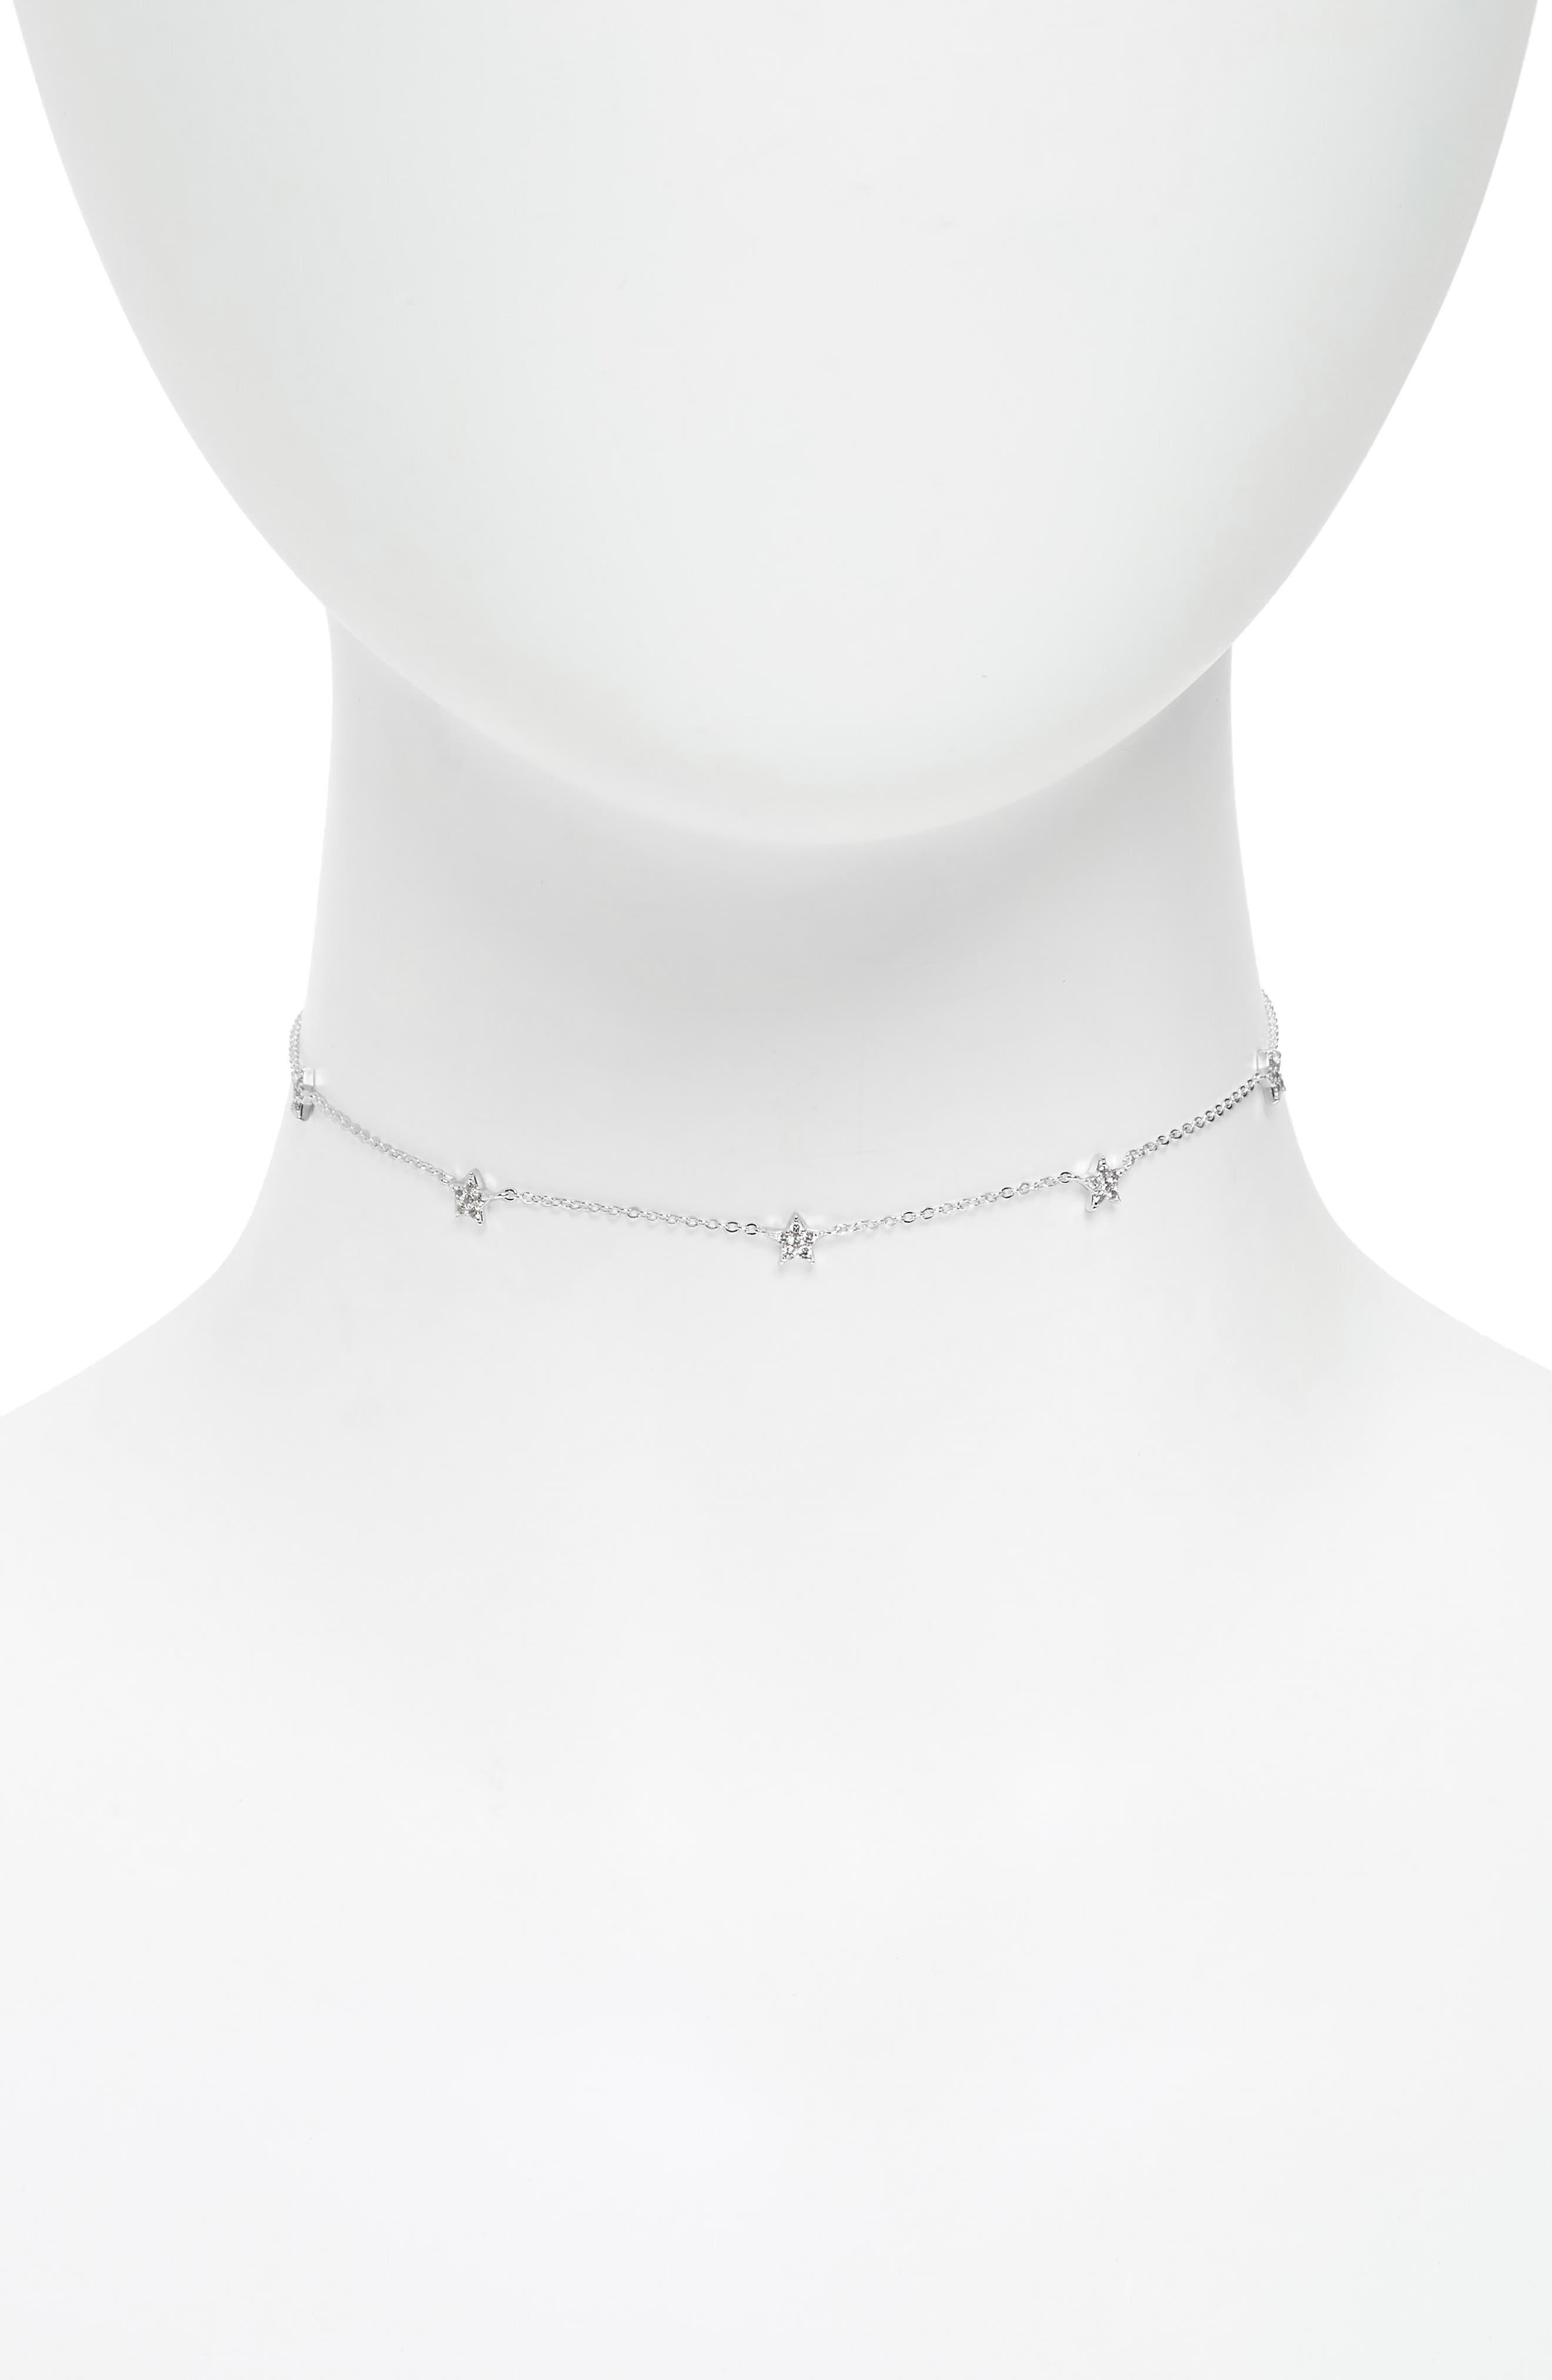 ARGENTO VIVO Pavé Star Choker Necklace, Main, color, SILVER